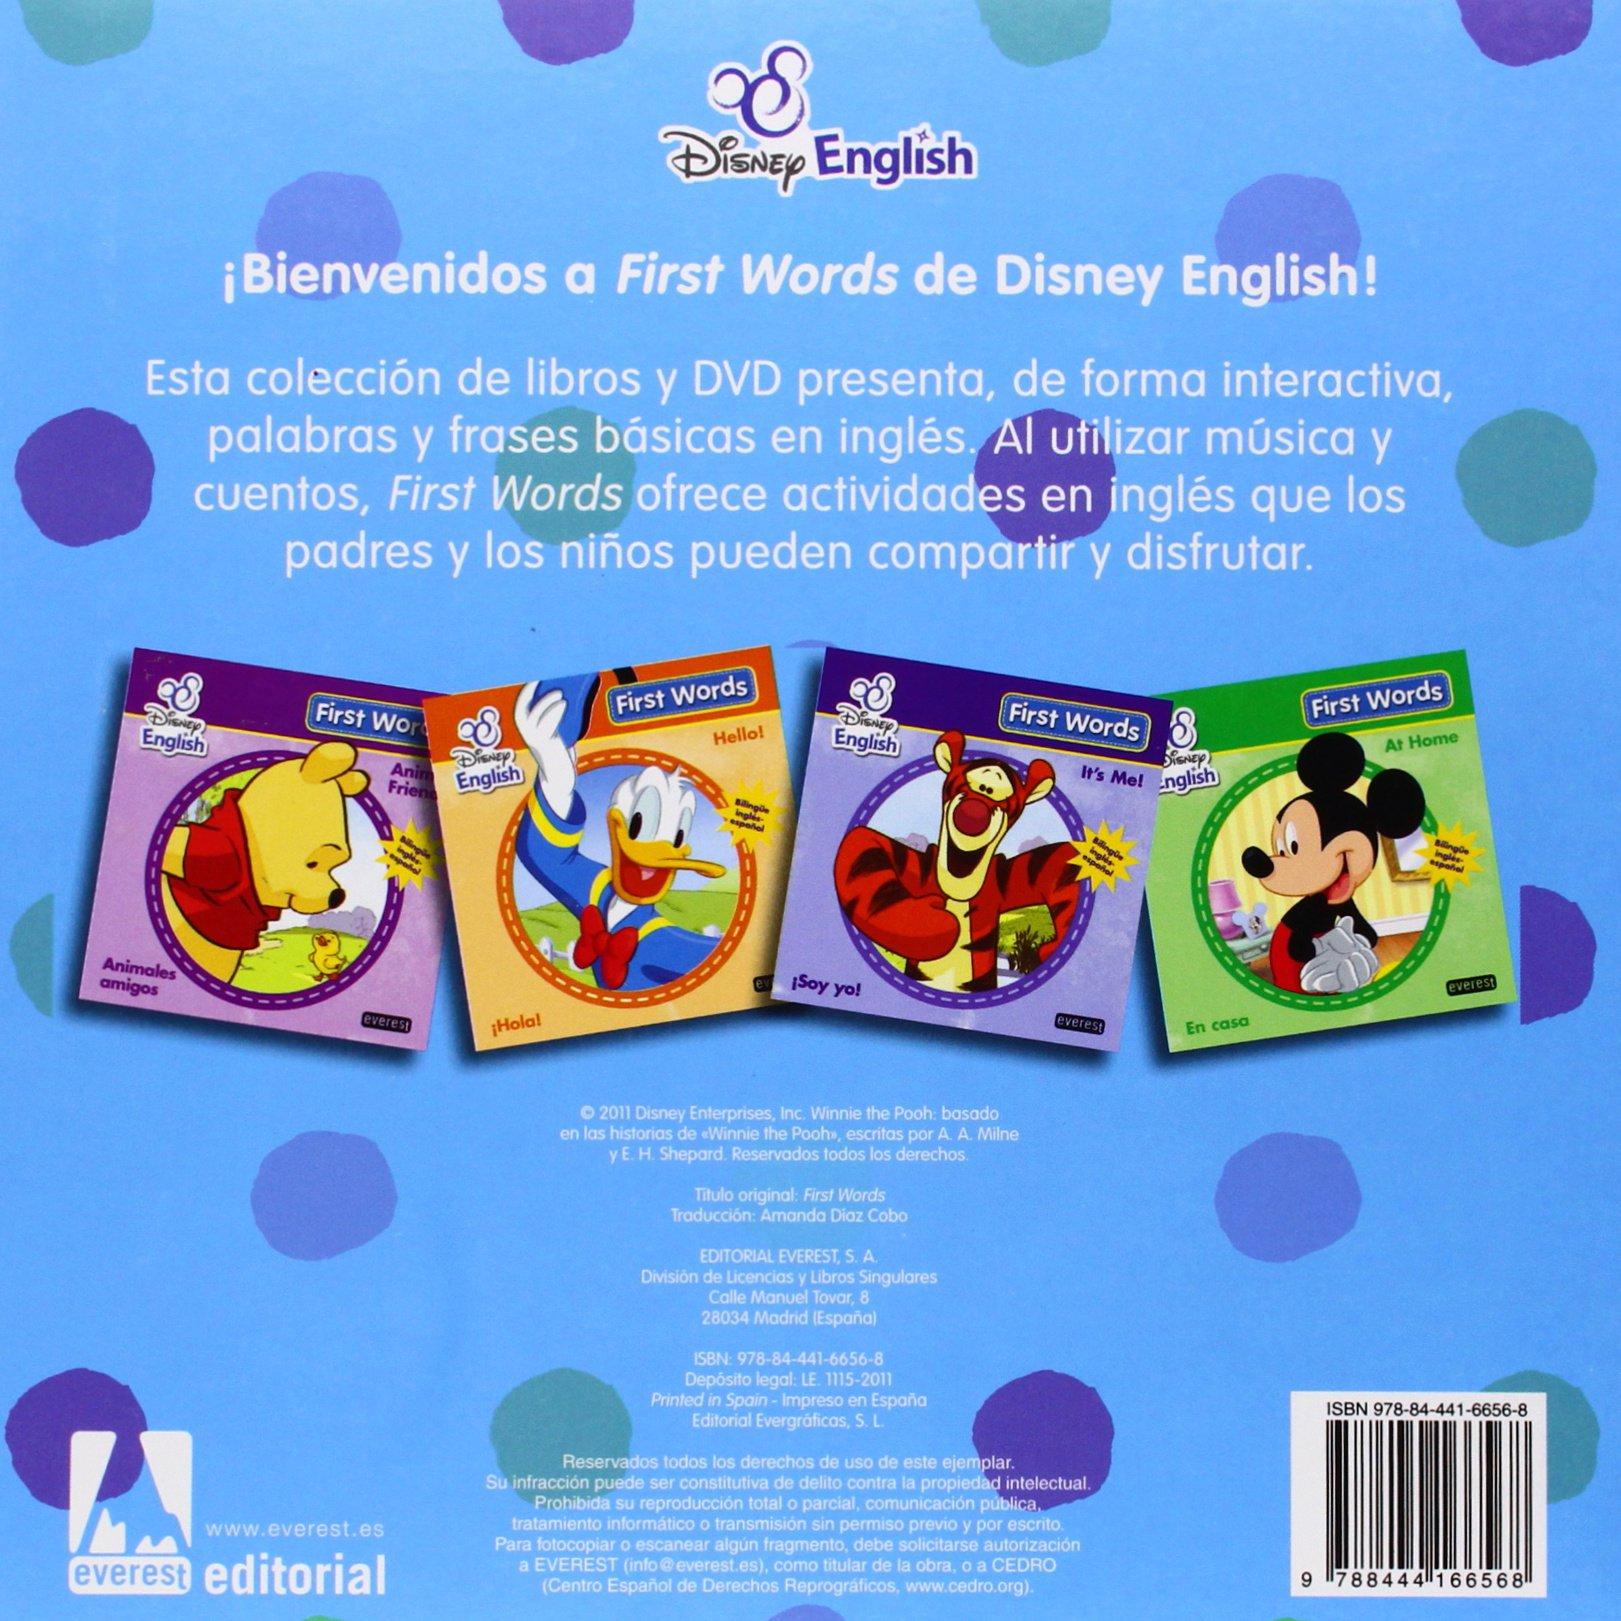 Primeras palabras=First words. Caja: Amanda, (trad.) Walt Disney Company ; Díaz Cobo: 9788444166568: Amazon.com: Books